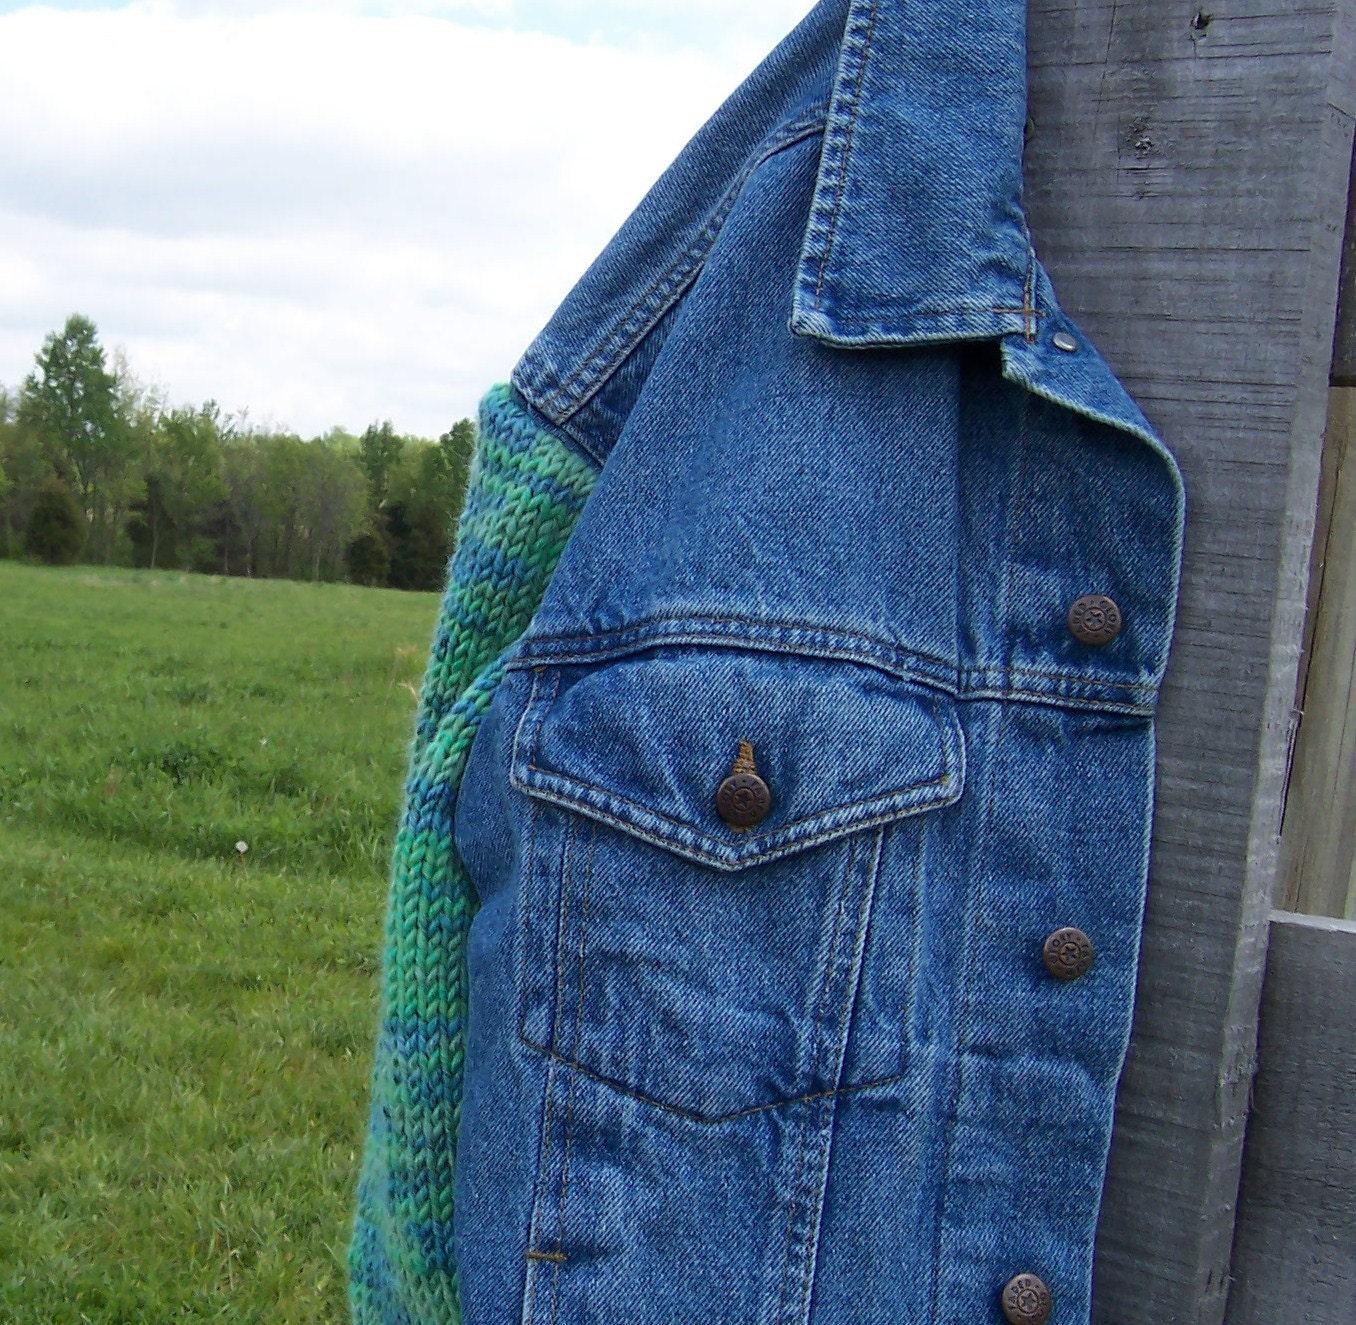 Denim Jacket Knitting Pattern : Denim Jacket Hand Knit Sweater Sleeves Upcycled Blue Jean